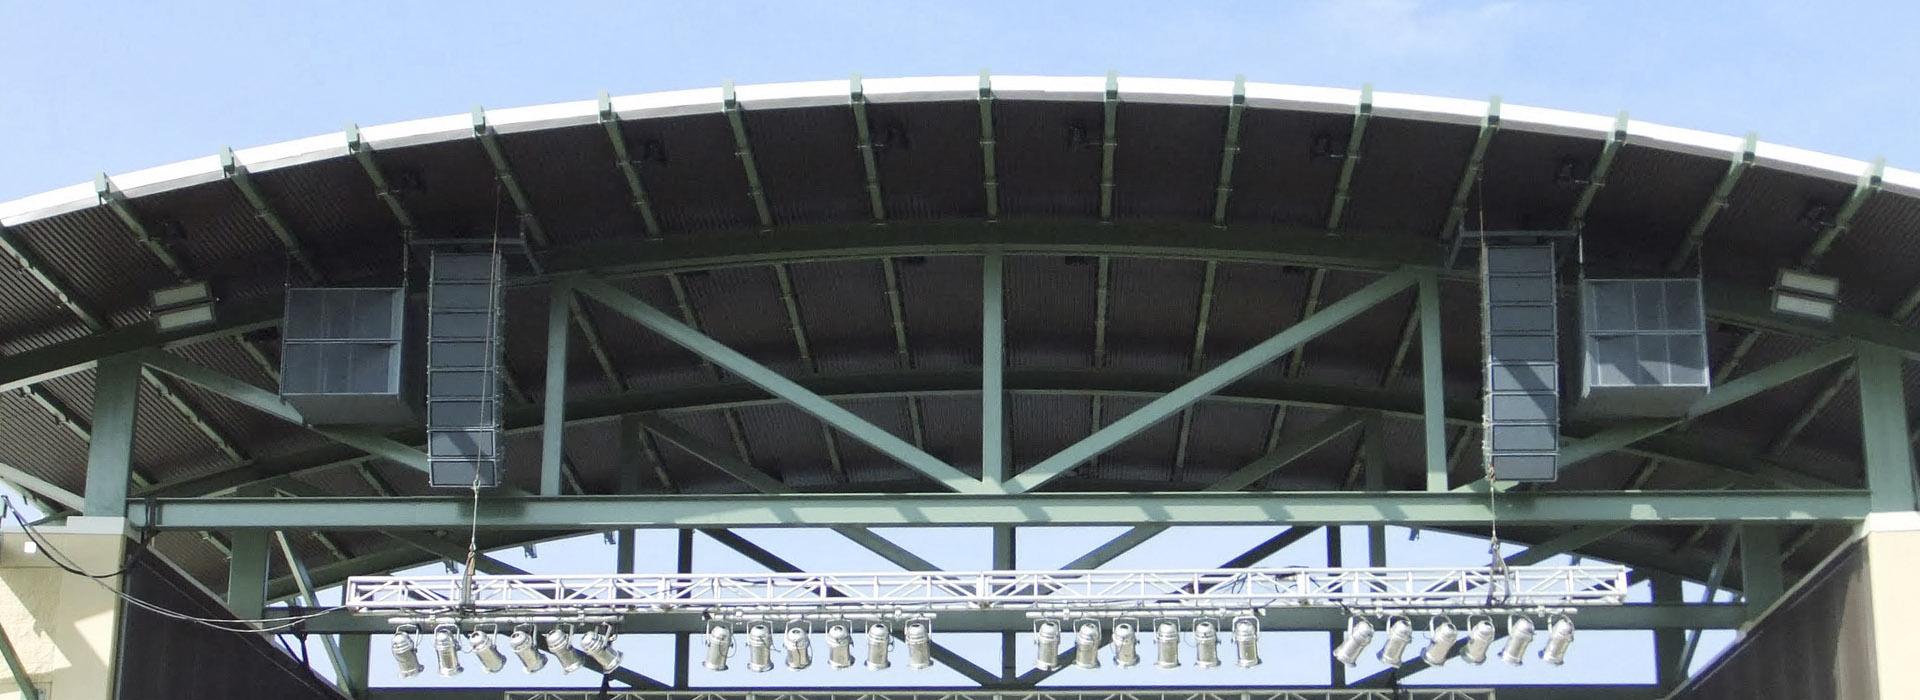 ProTech_Live_Production_Installation_Pier_Park_Florida